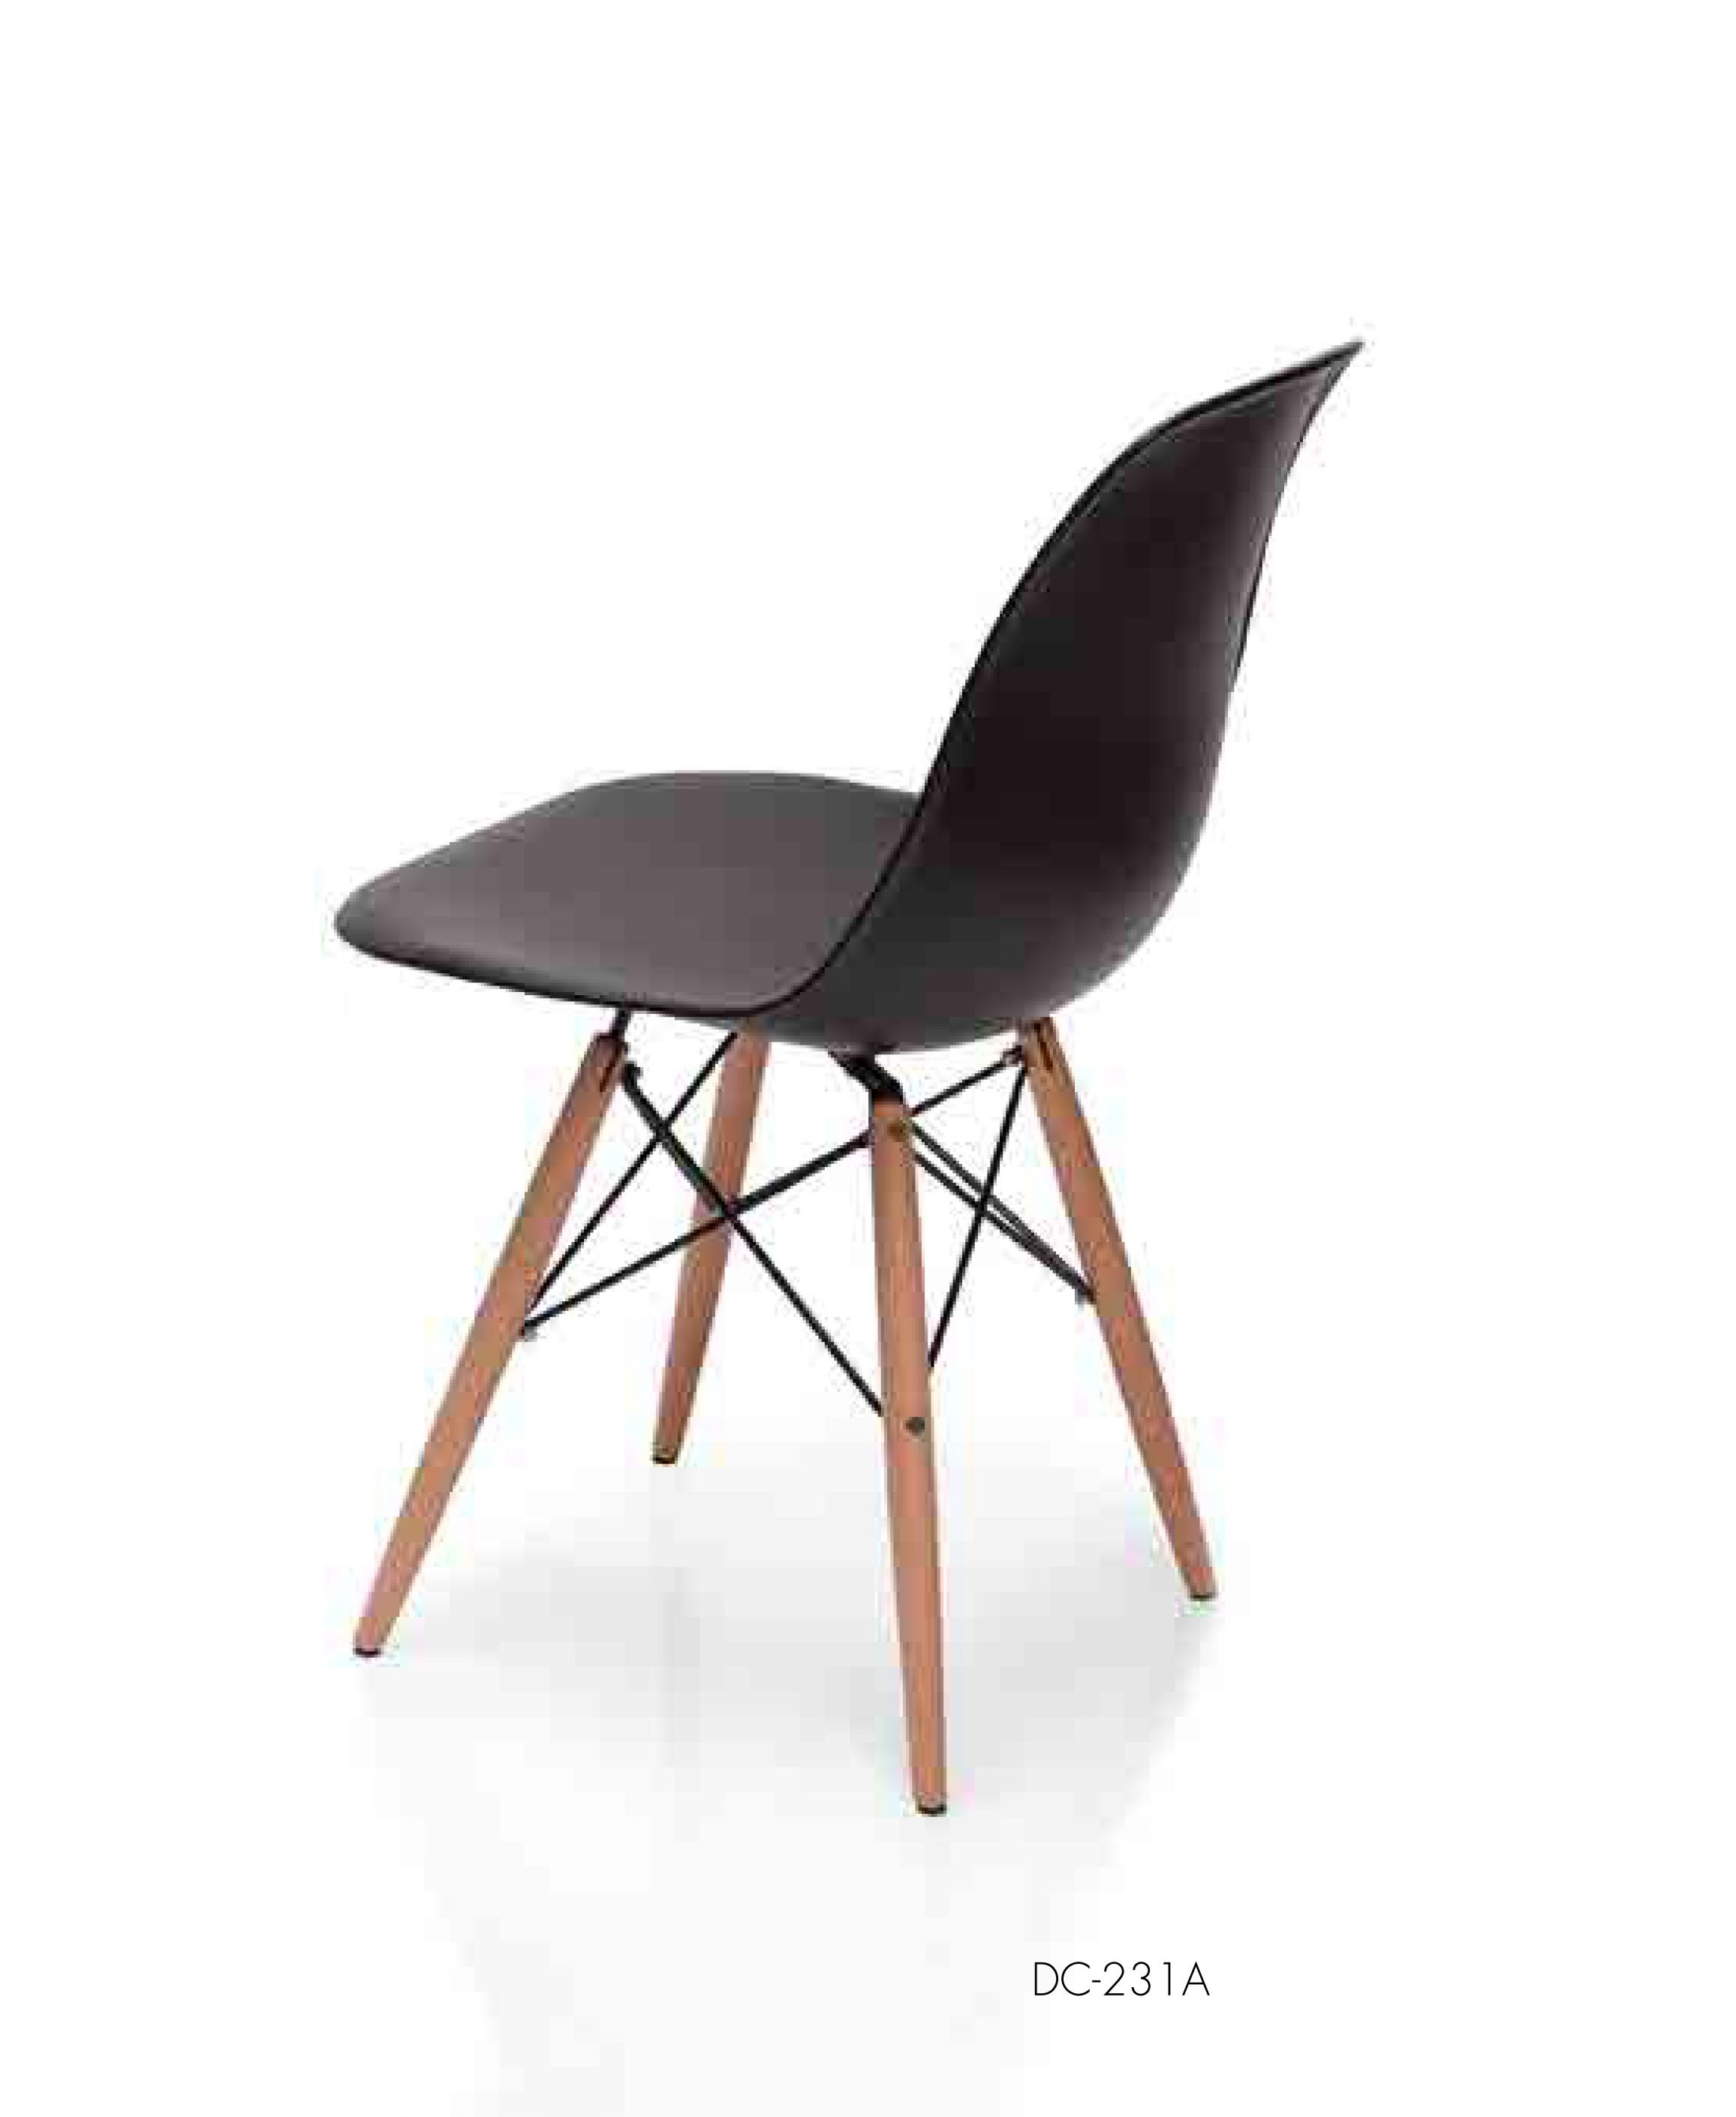 Silla moderna dise o muebles valencia for Sillas diseno valencia